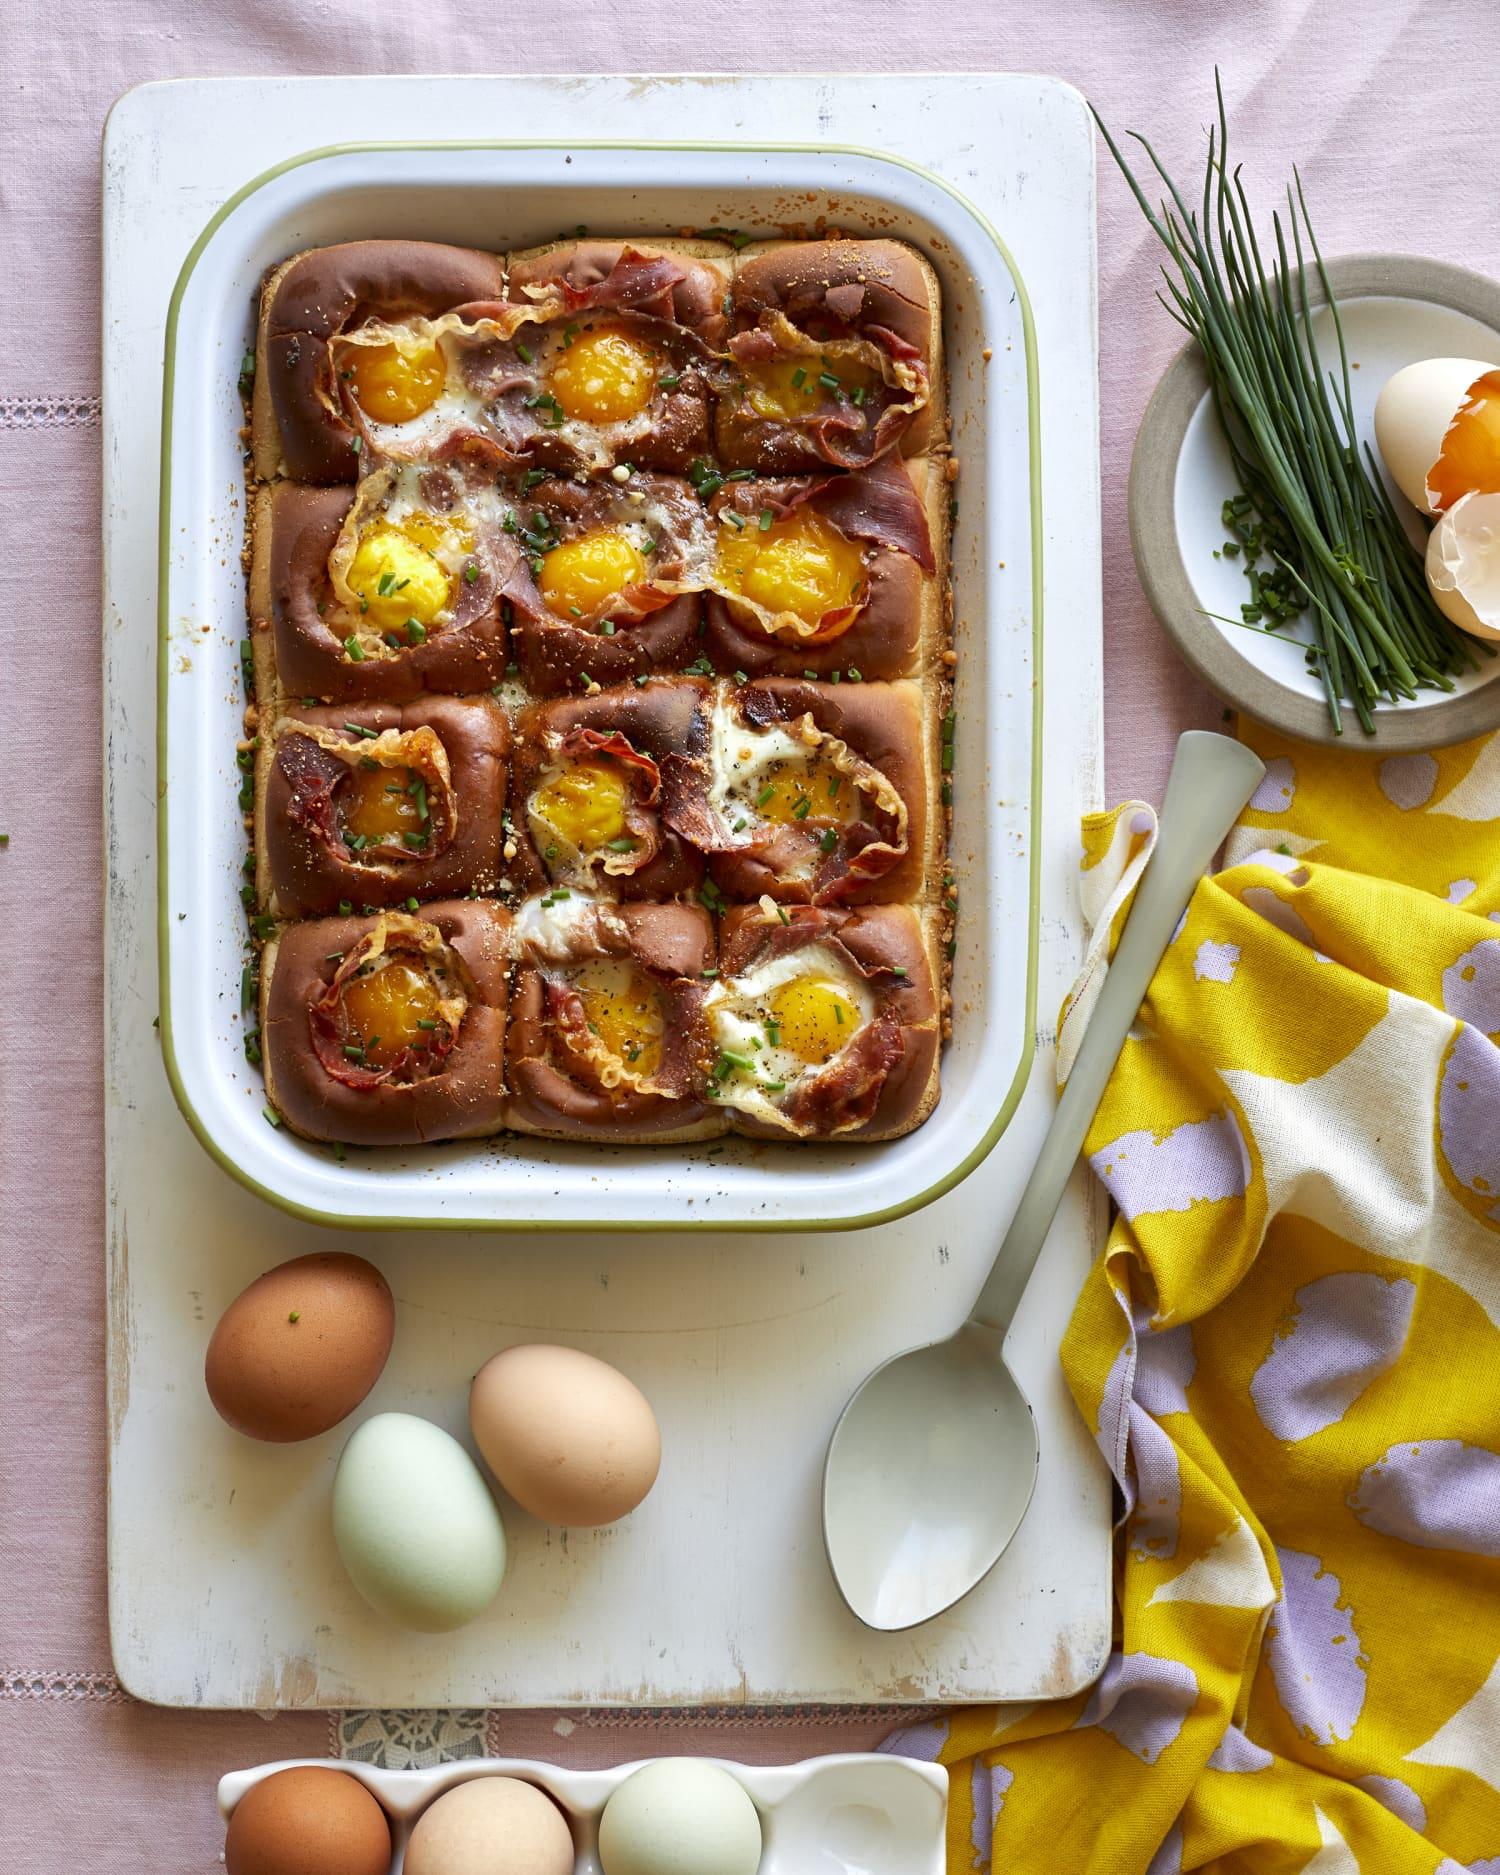 Recipe: Hawaiian Roll Egg-in-a-Hole